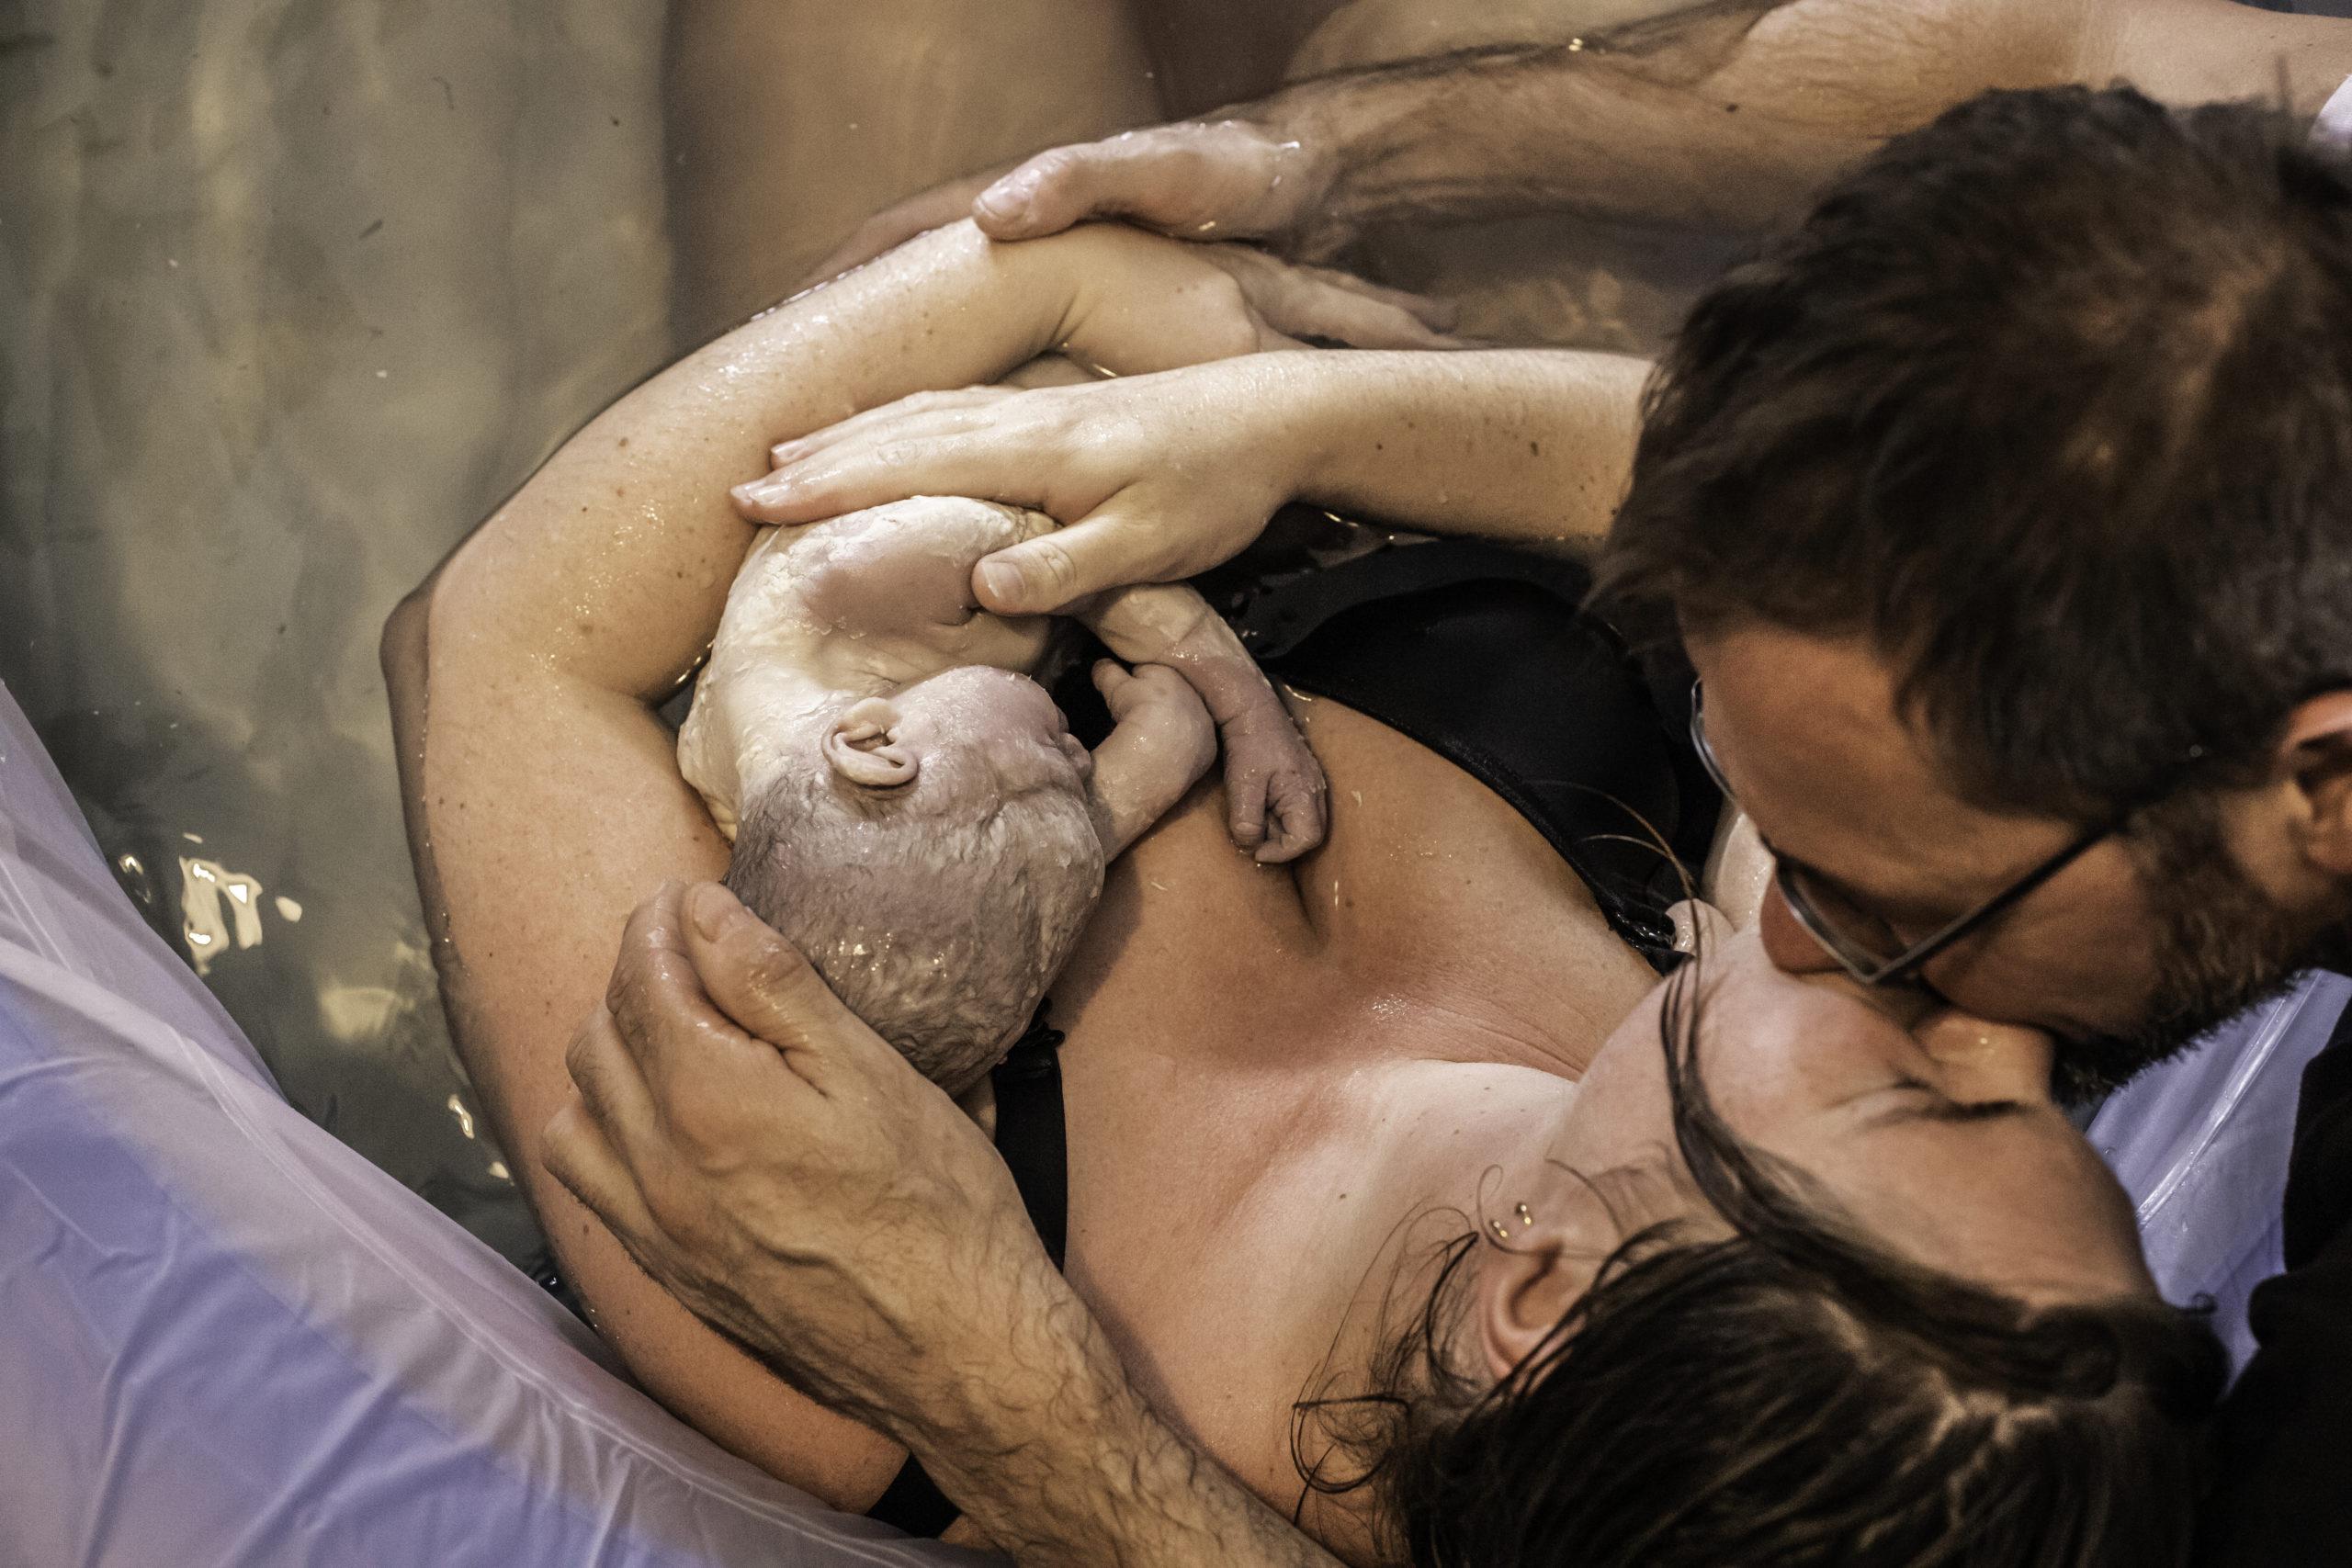 geboortefotografie-badbevalling